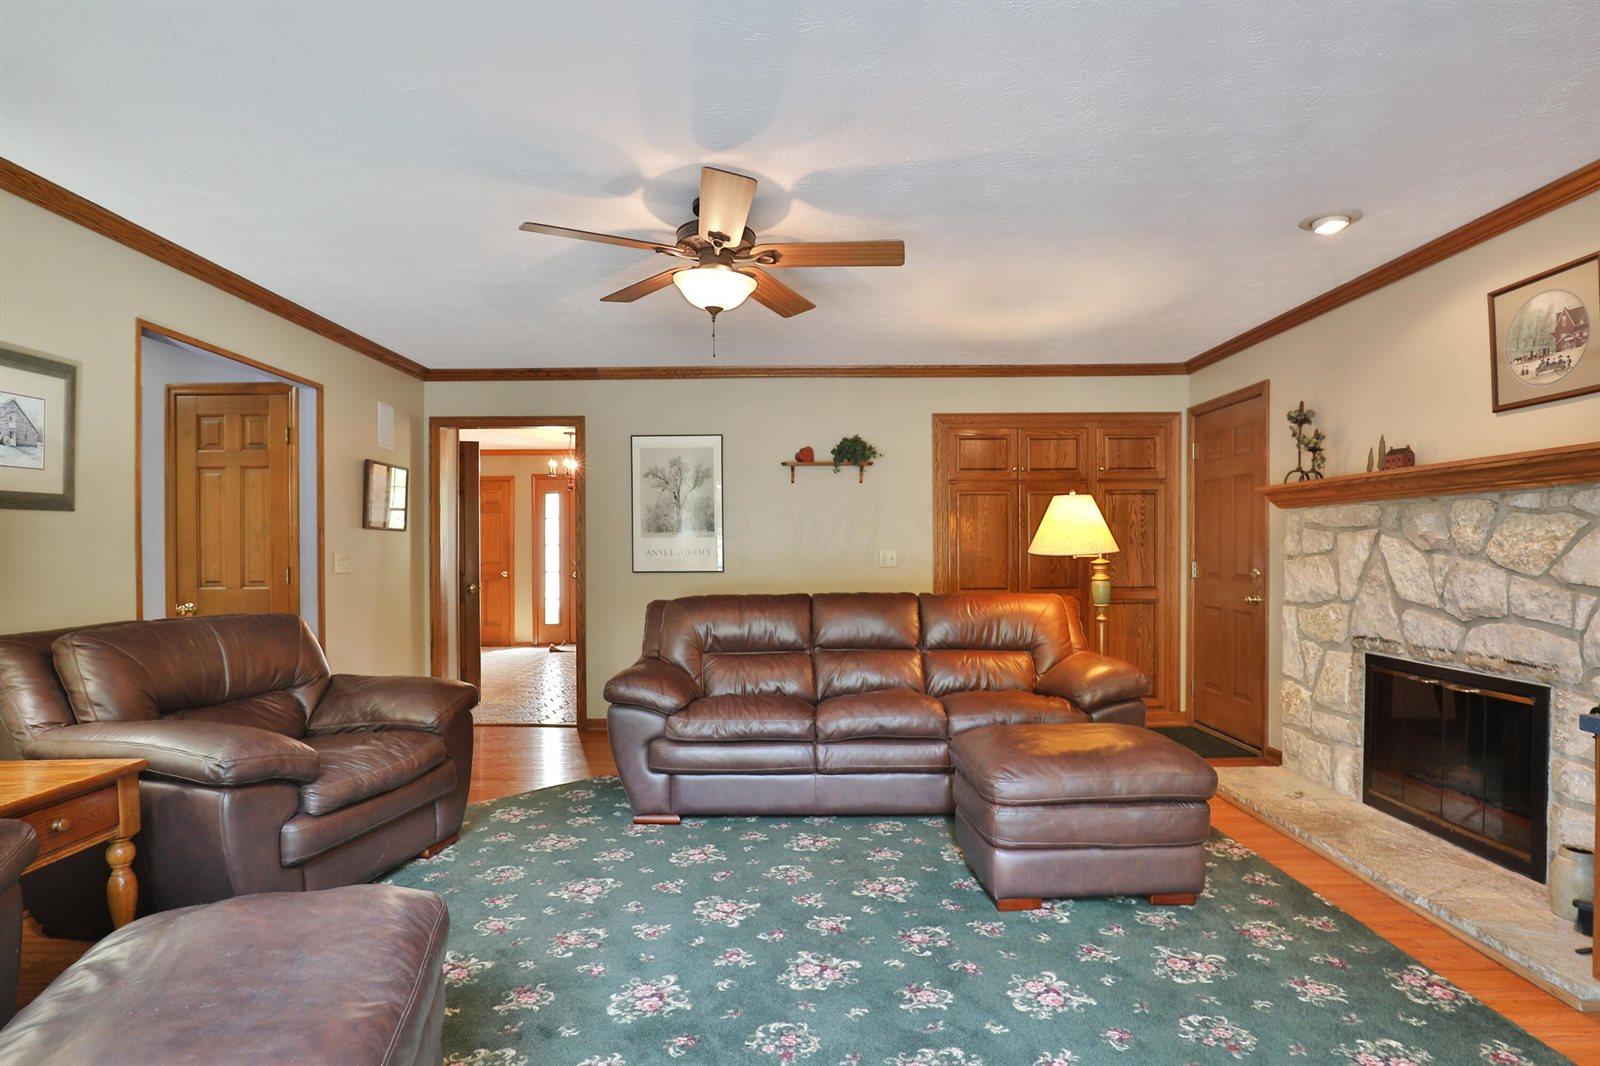 798 Tweed Court, Worthington, OH 43085